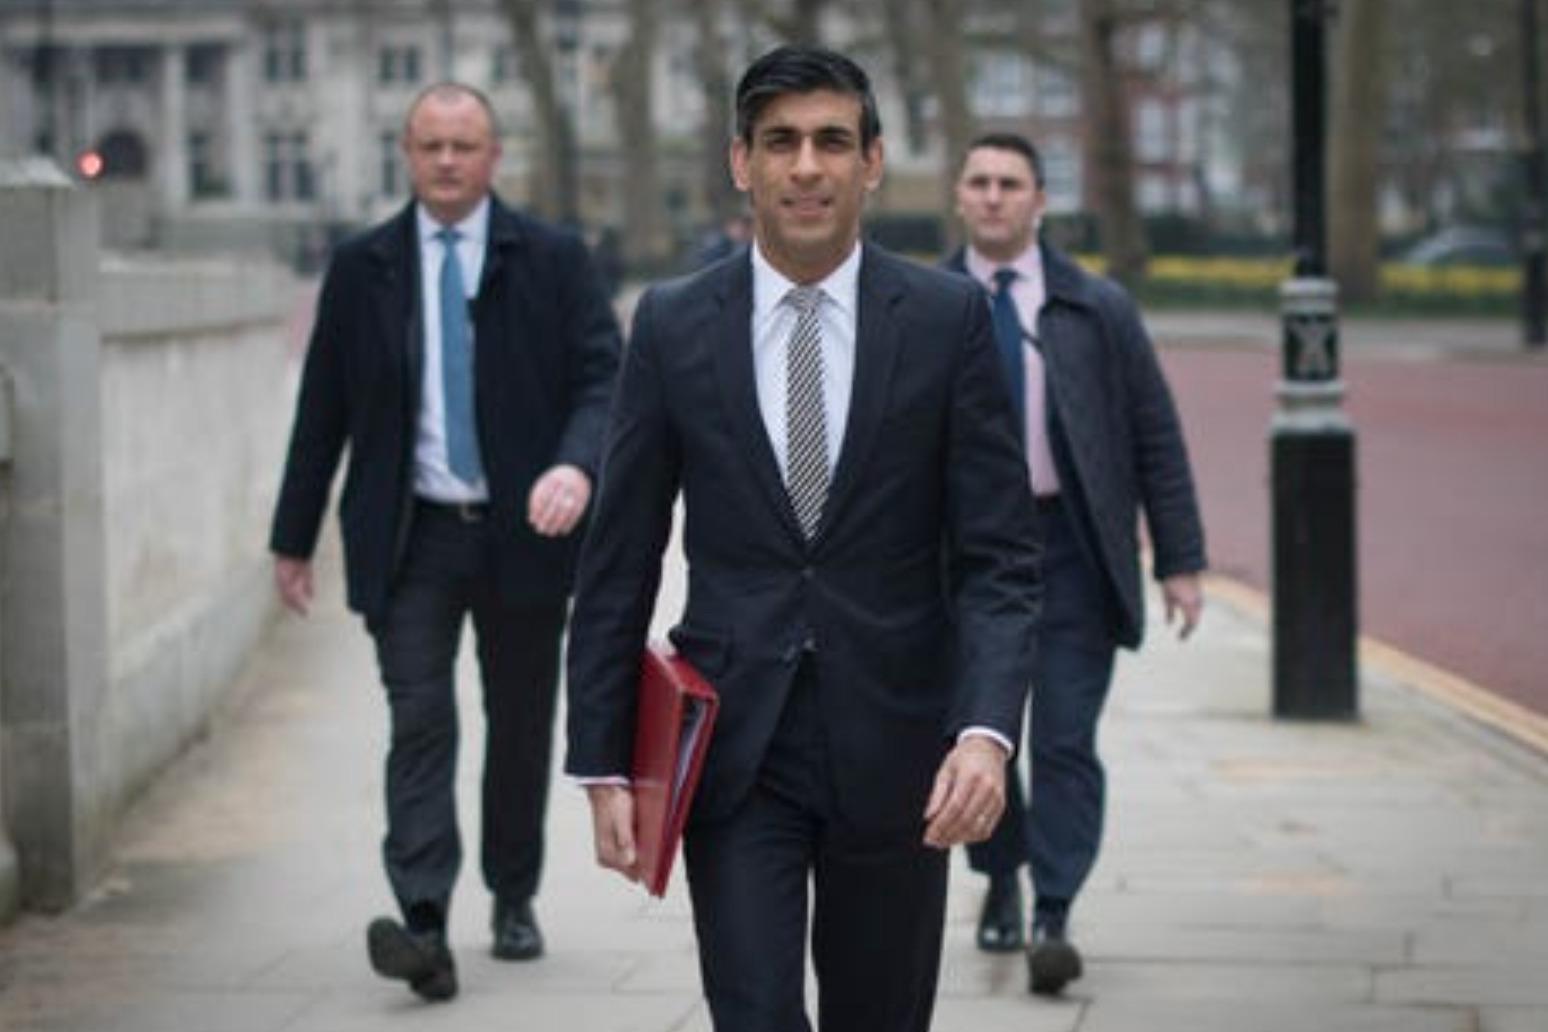 Chancellor to extend furlough scheme until September as he unveils Budget